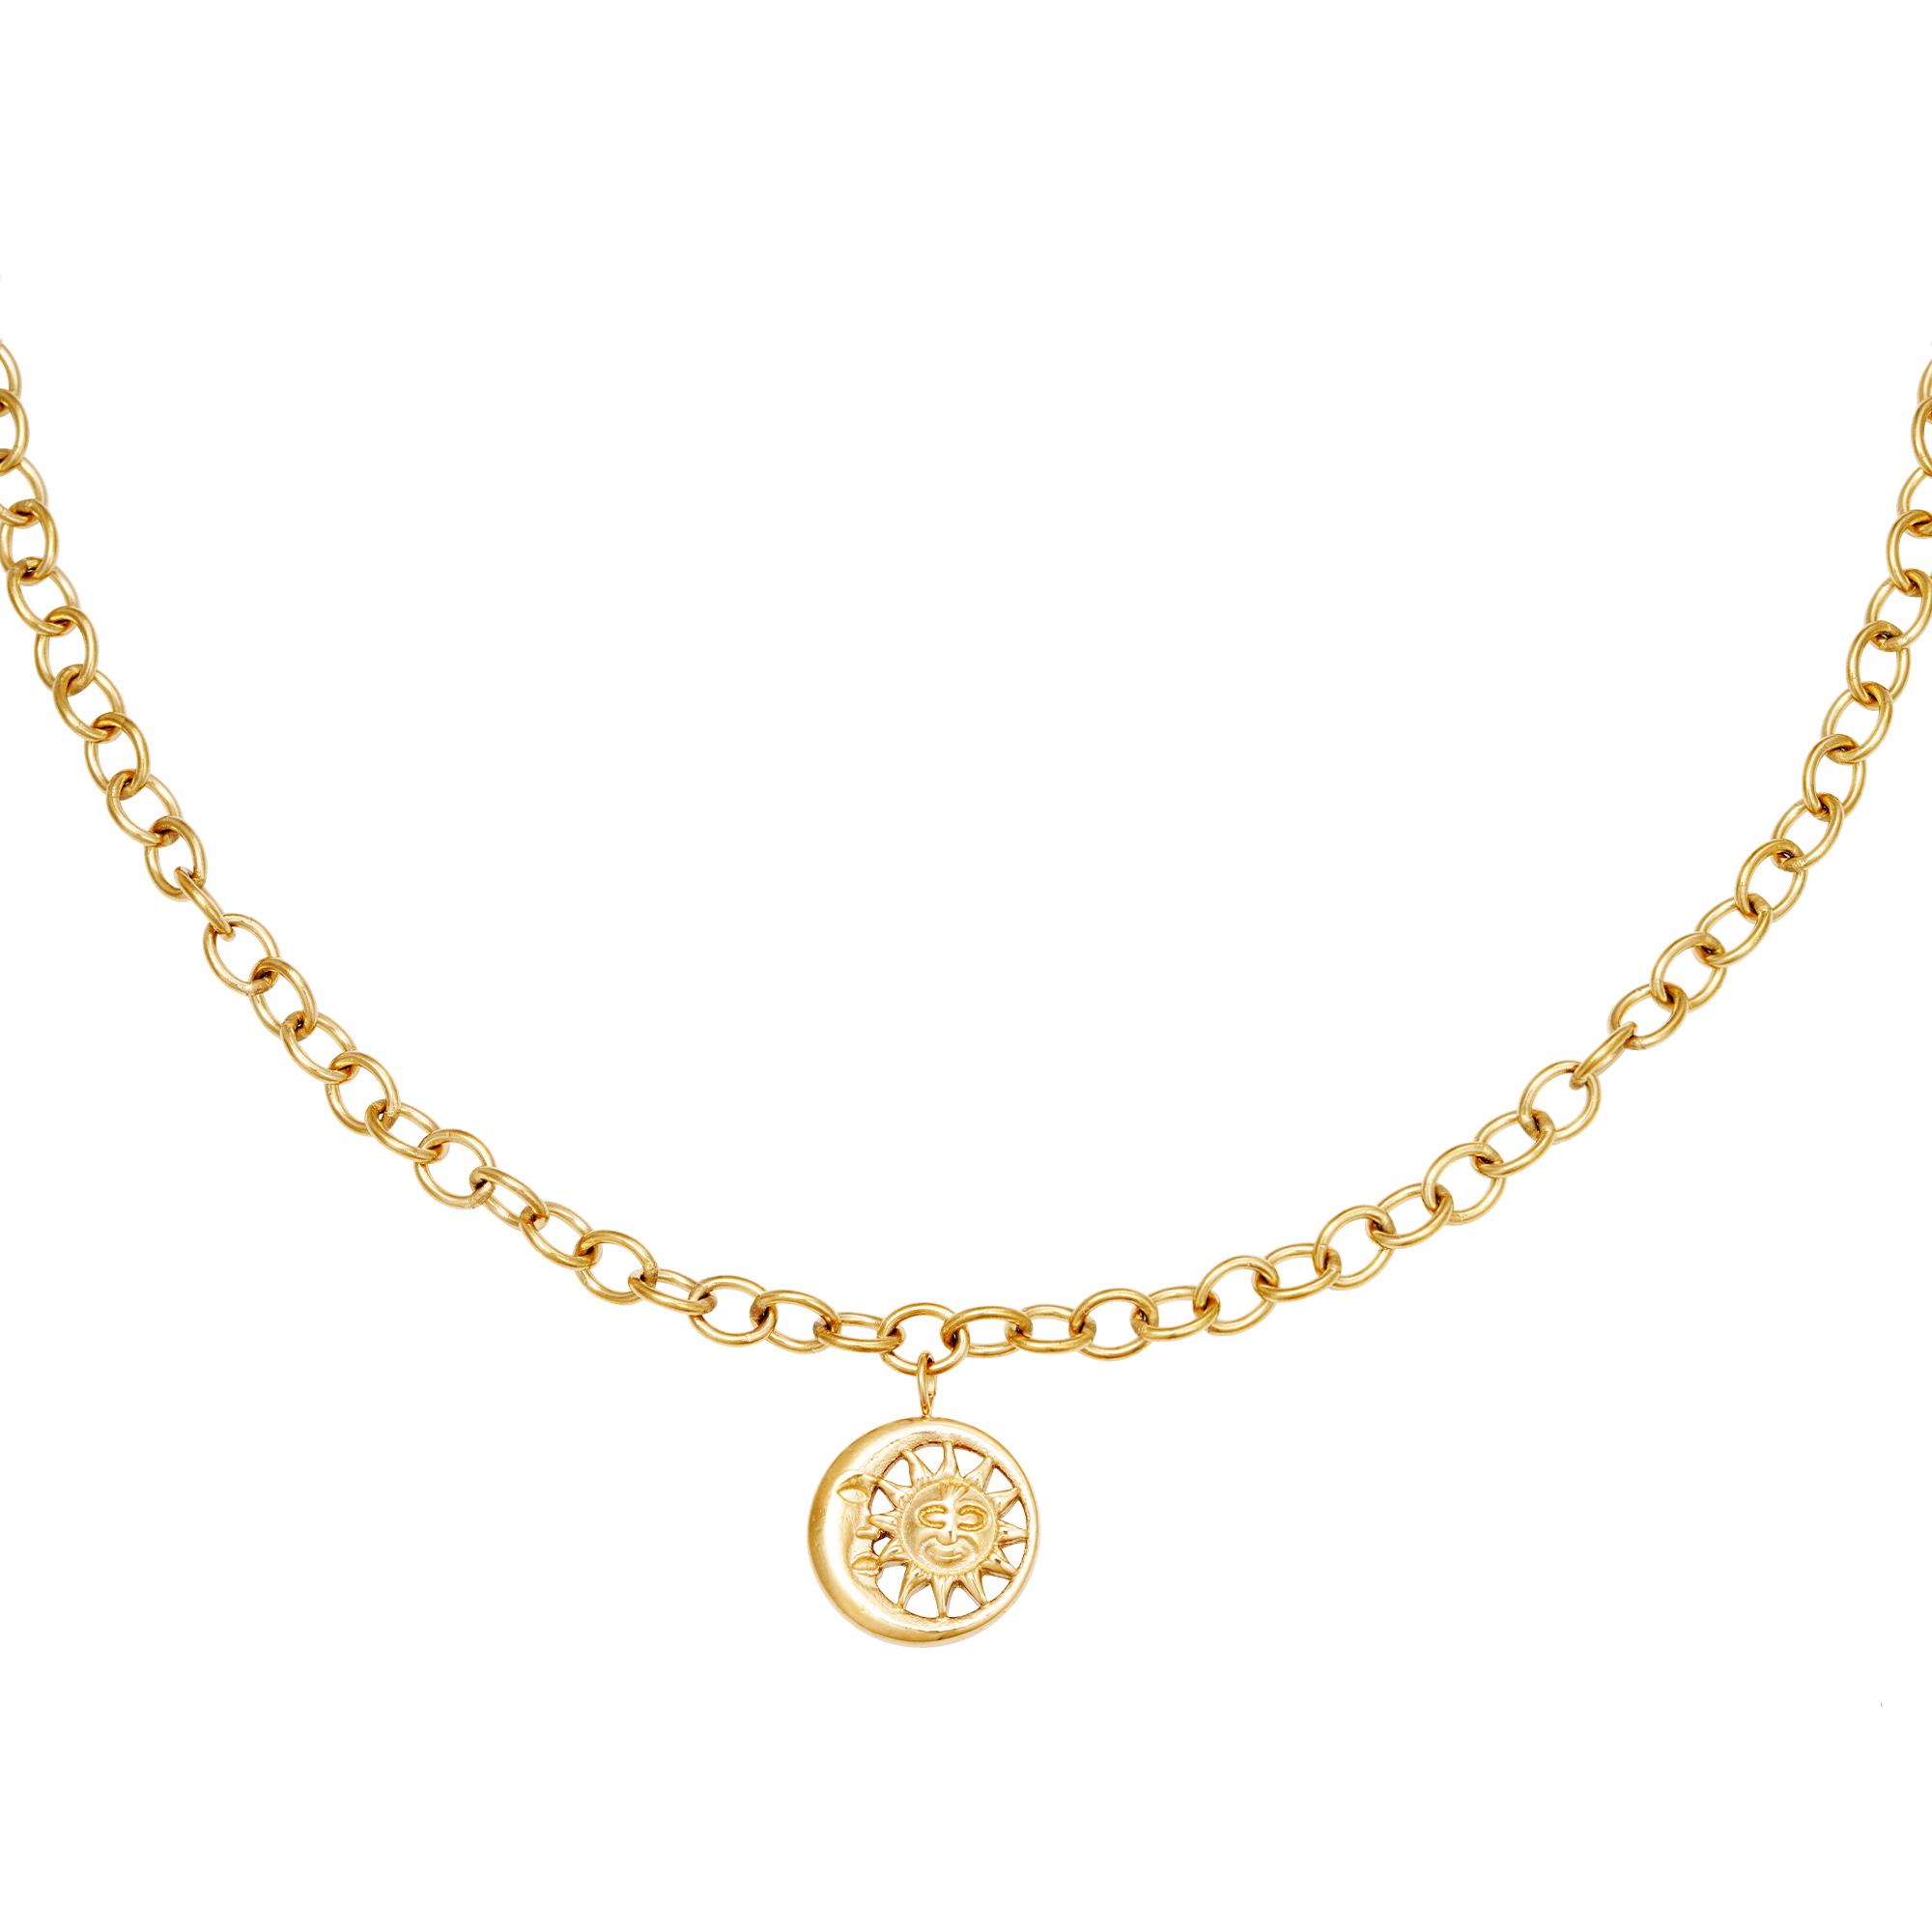 Collar Moonlight Chain